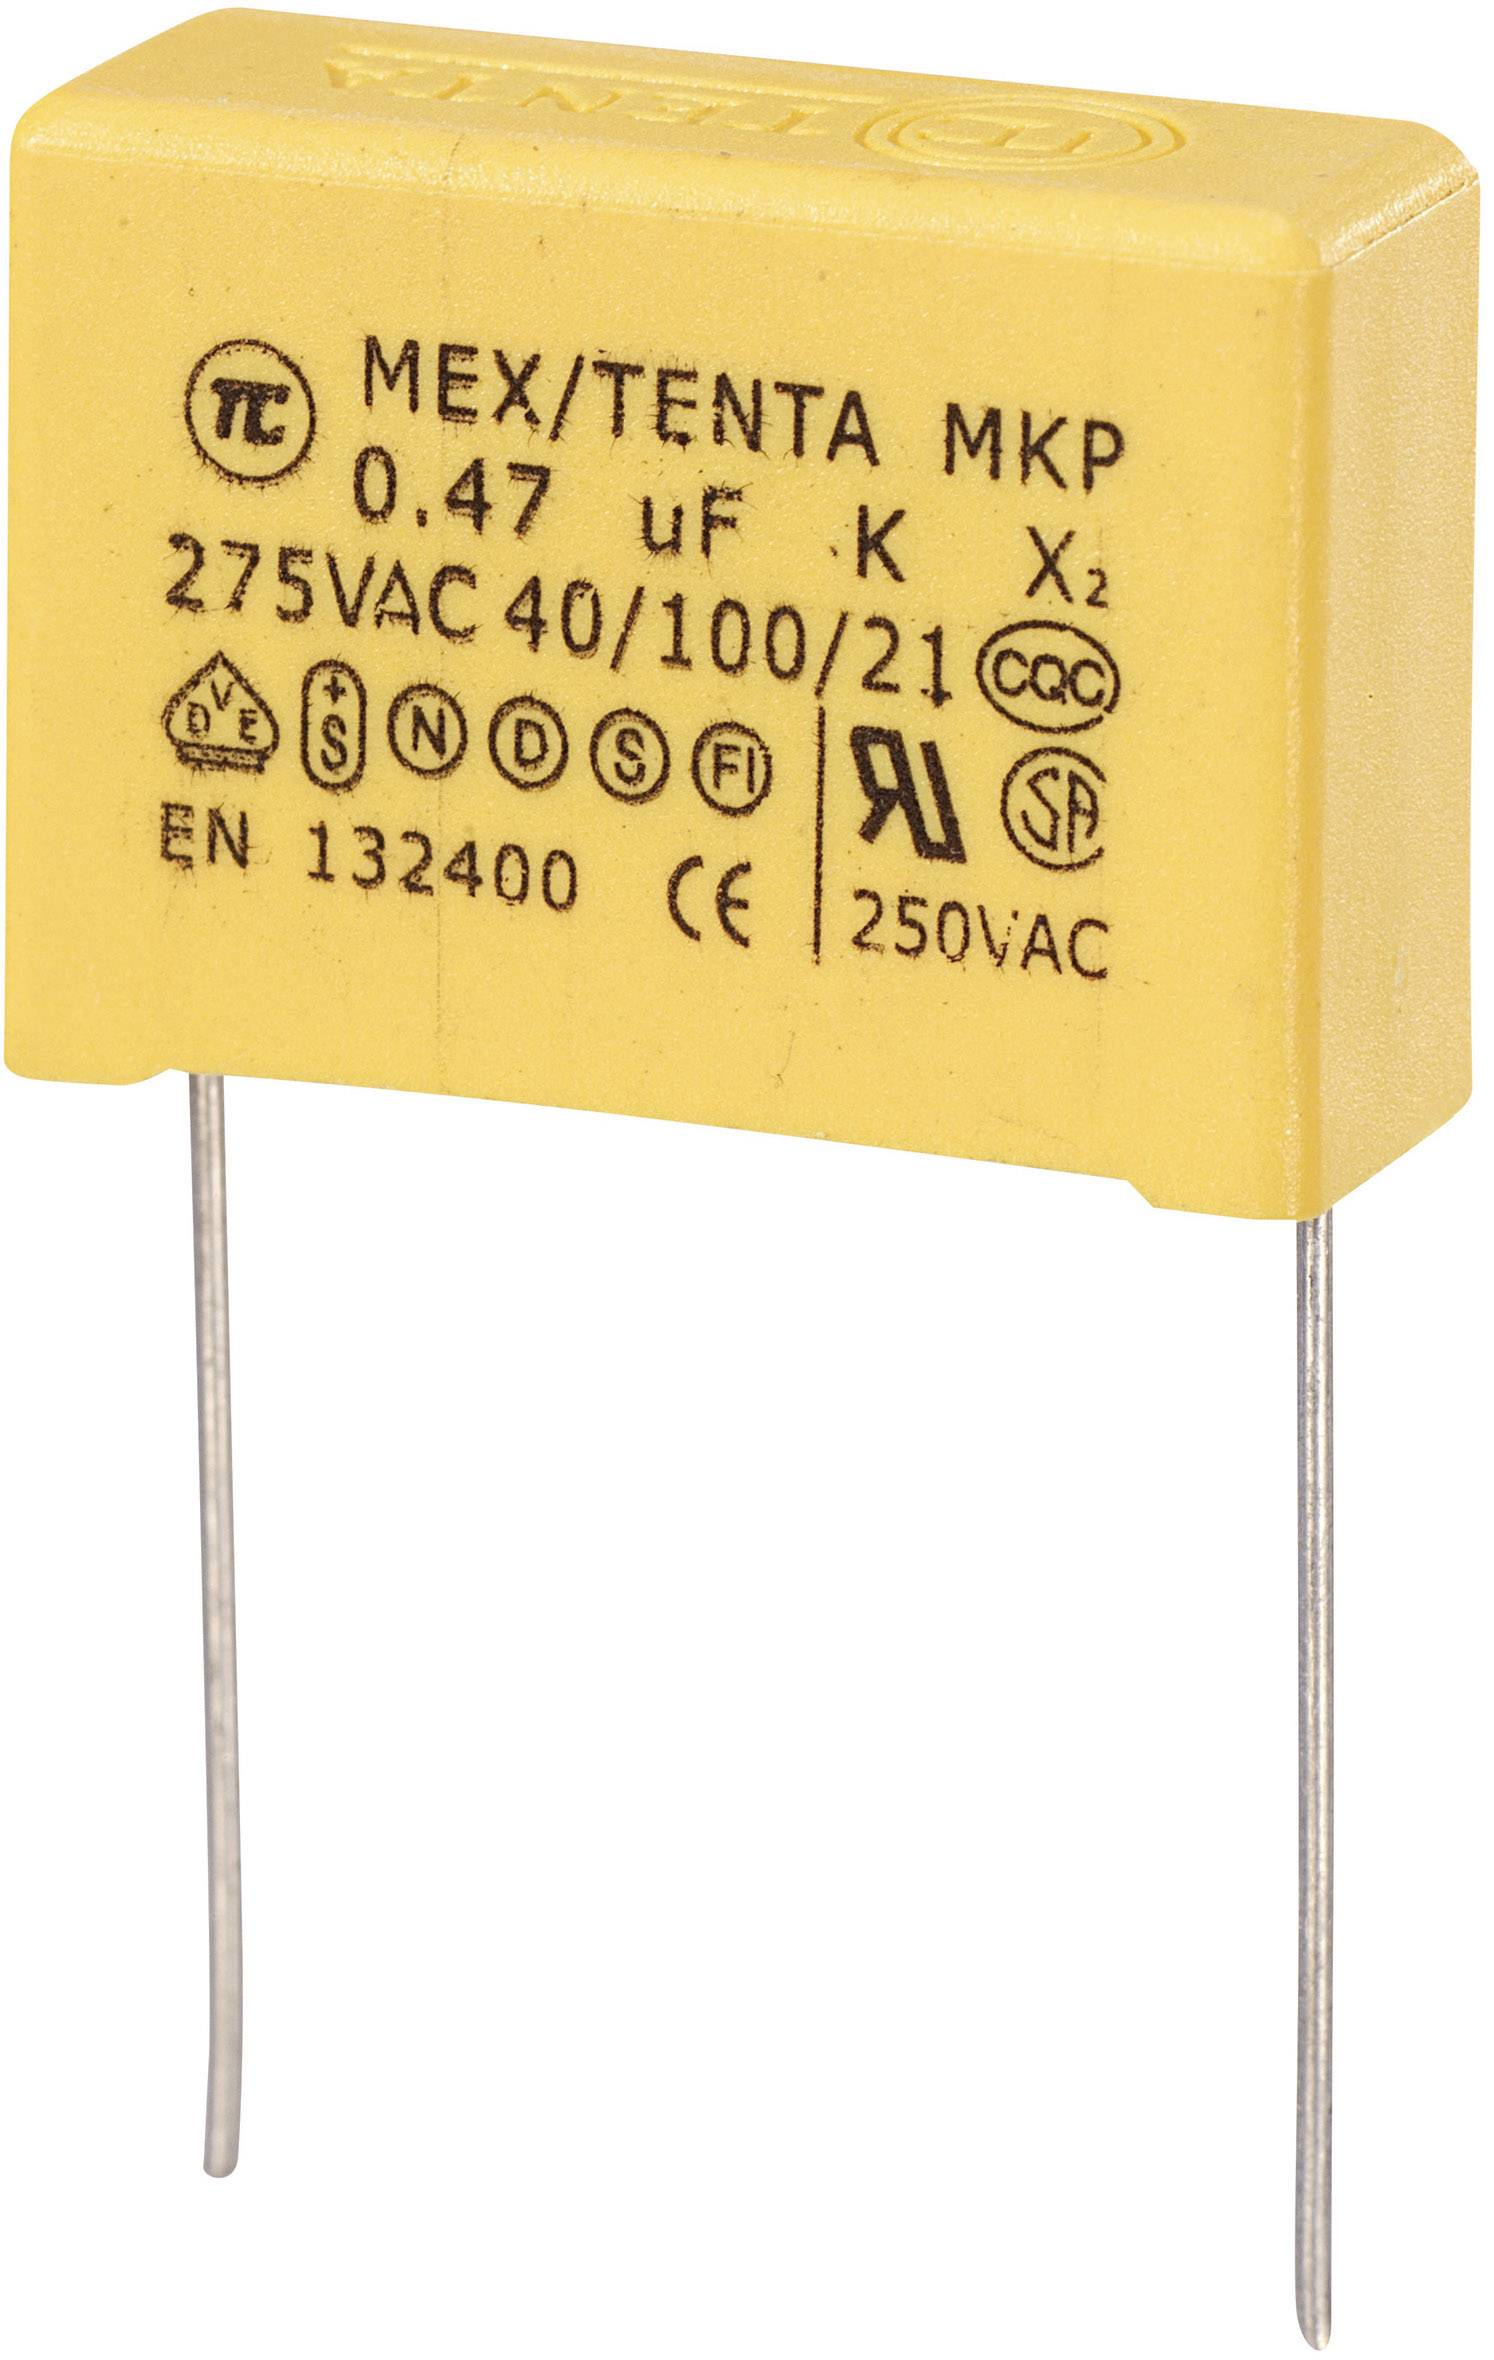 Foliový kondenzátor MKP, 0,47 µF, X2 275 V/AC, 10 %, 26,5 x 10 x 19 mm